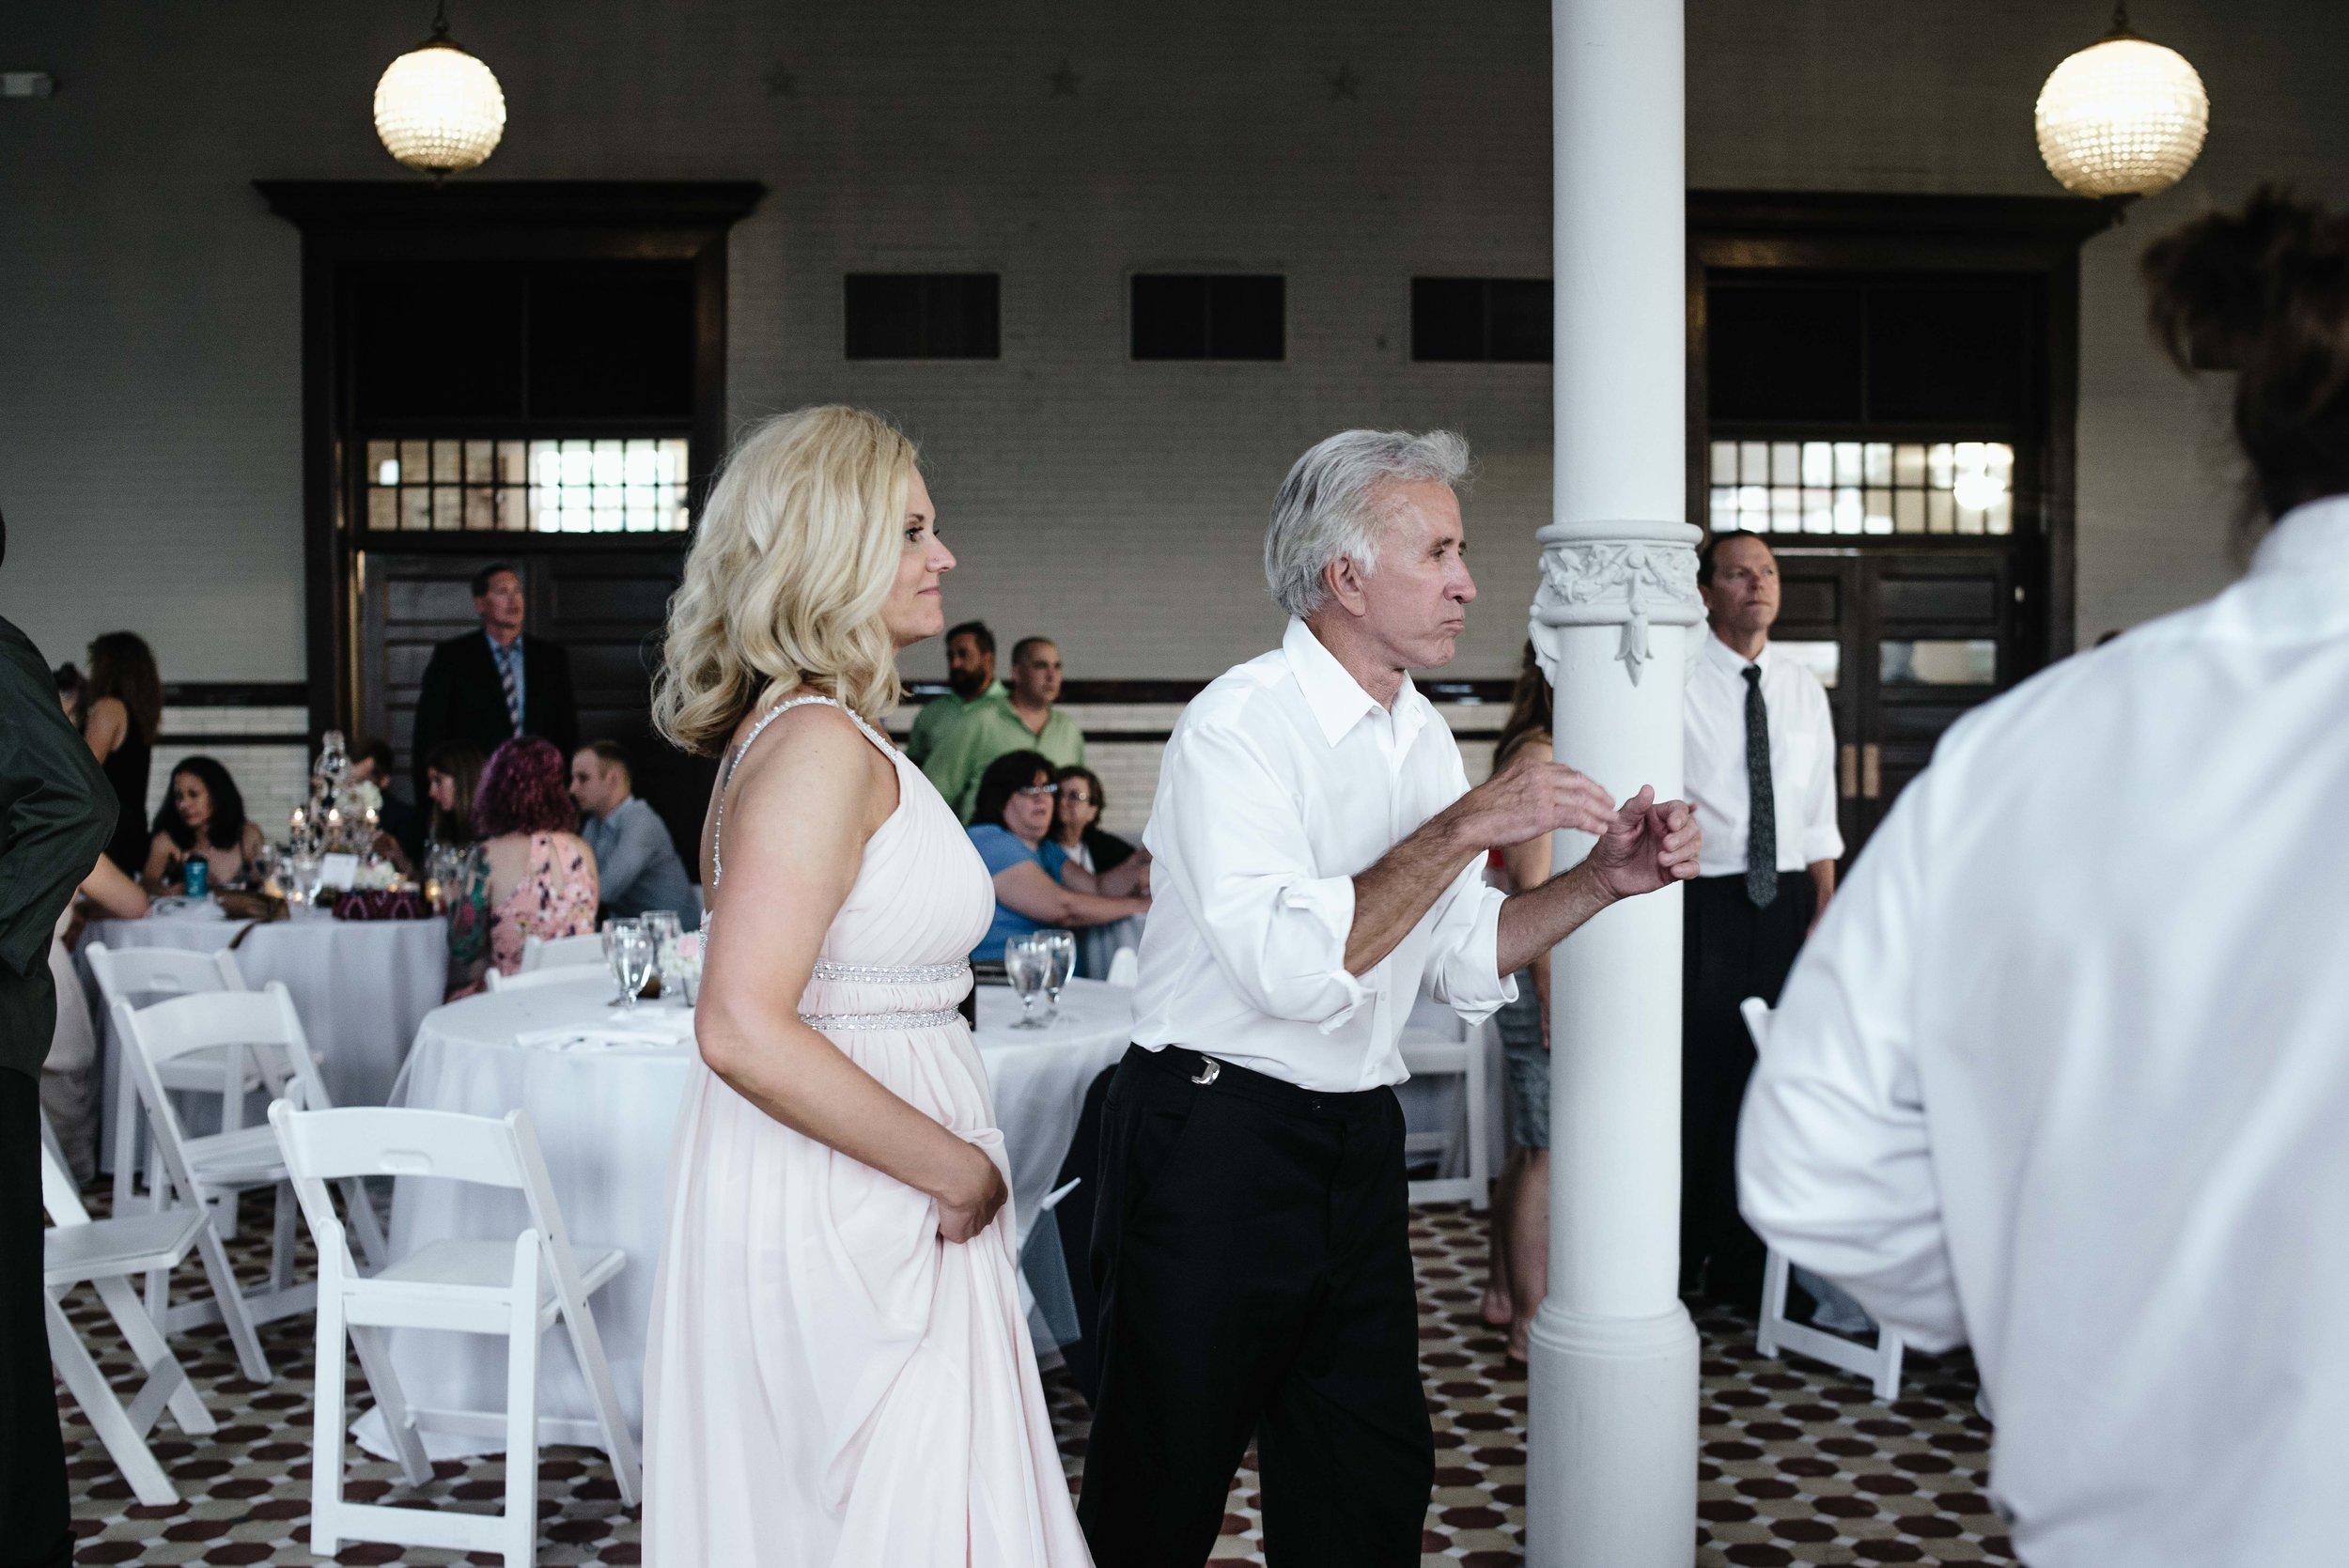 Mina-Steve-Blog-Indianapolis-Wedding-174.jpg